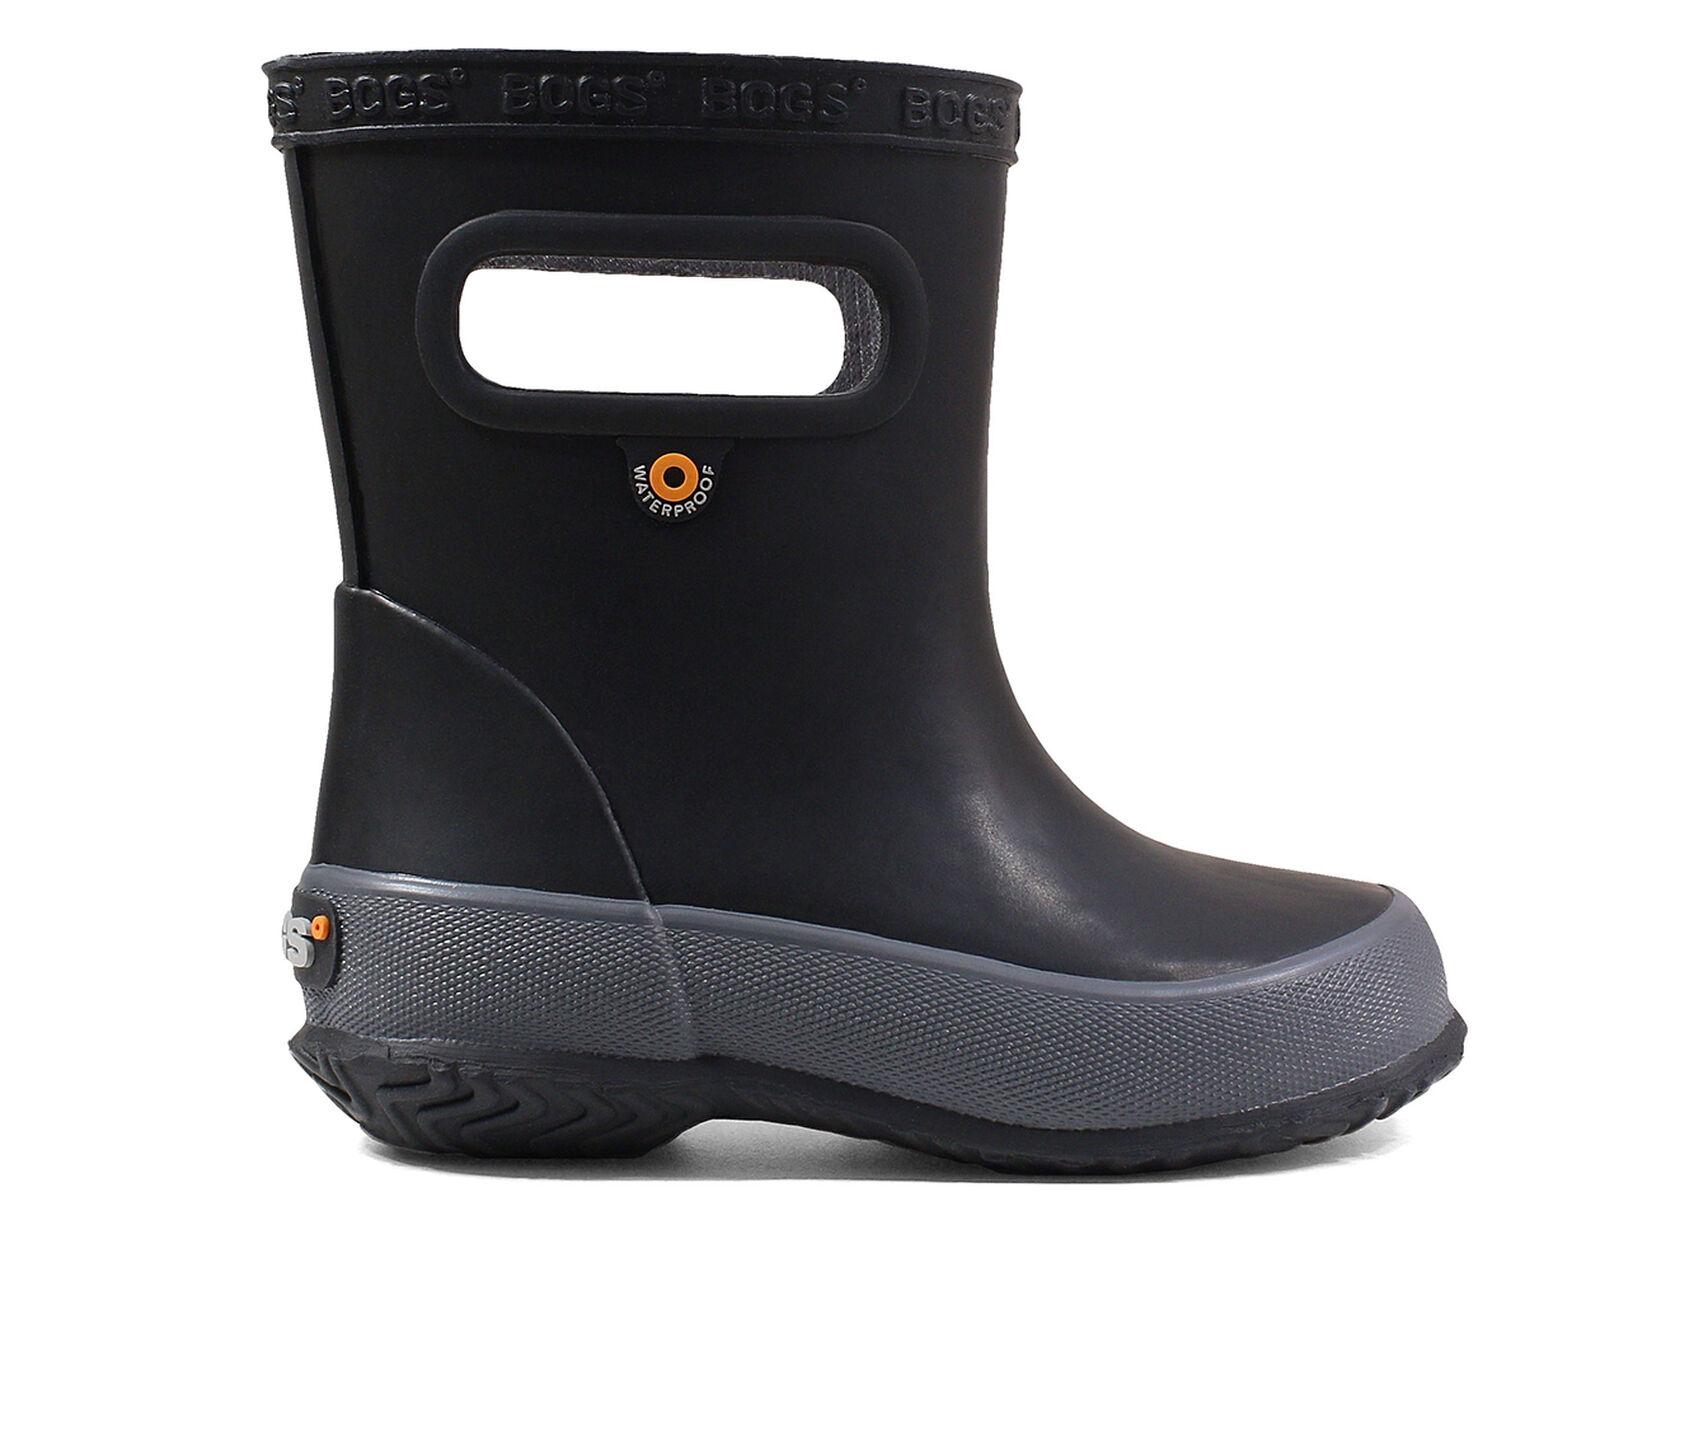 b625c27f6 ... Bogs Footwear Toddler & Little Kid Skipper Solid Rain Boots.  Previous